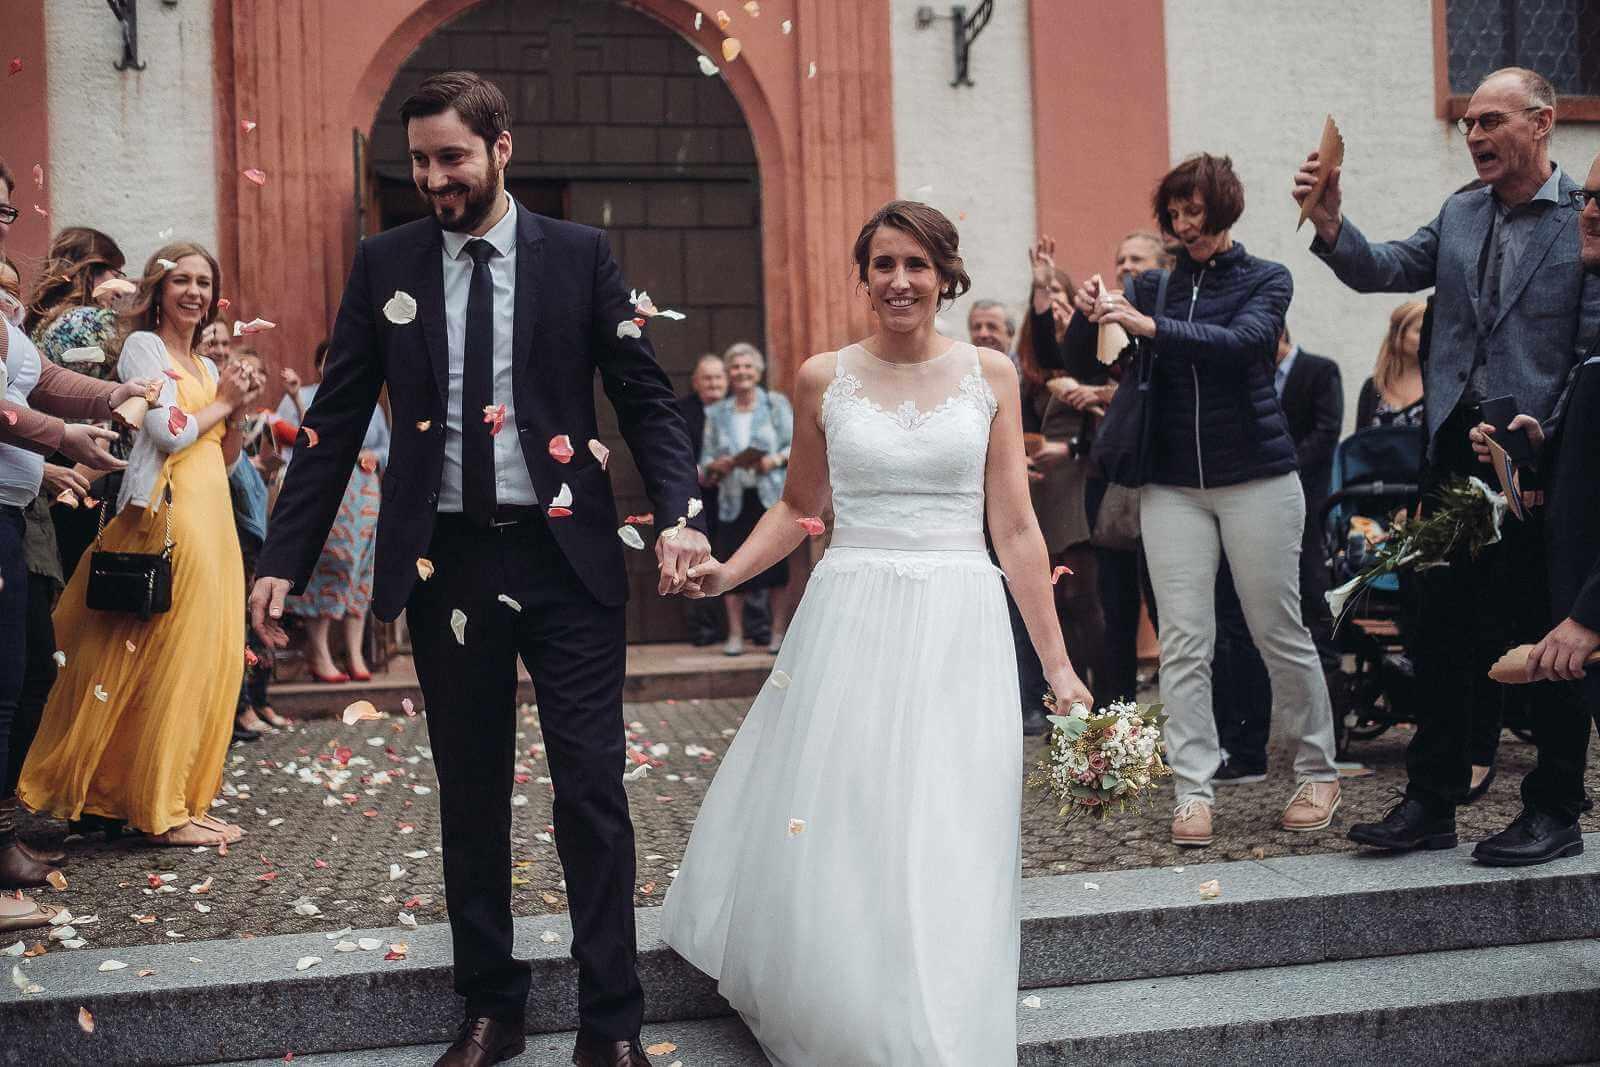 Hochzeitsfotograf Offenburg Zell am Harmersbach Bärenkeller (47)